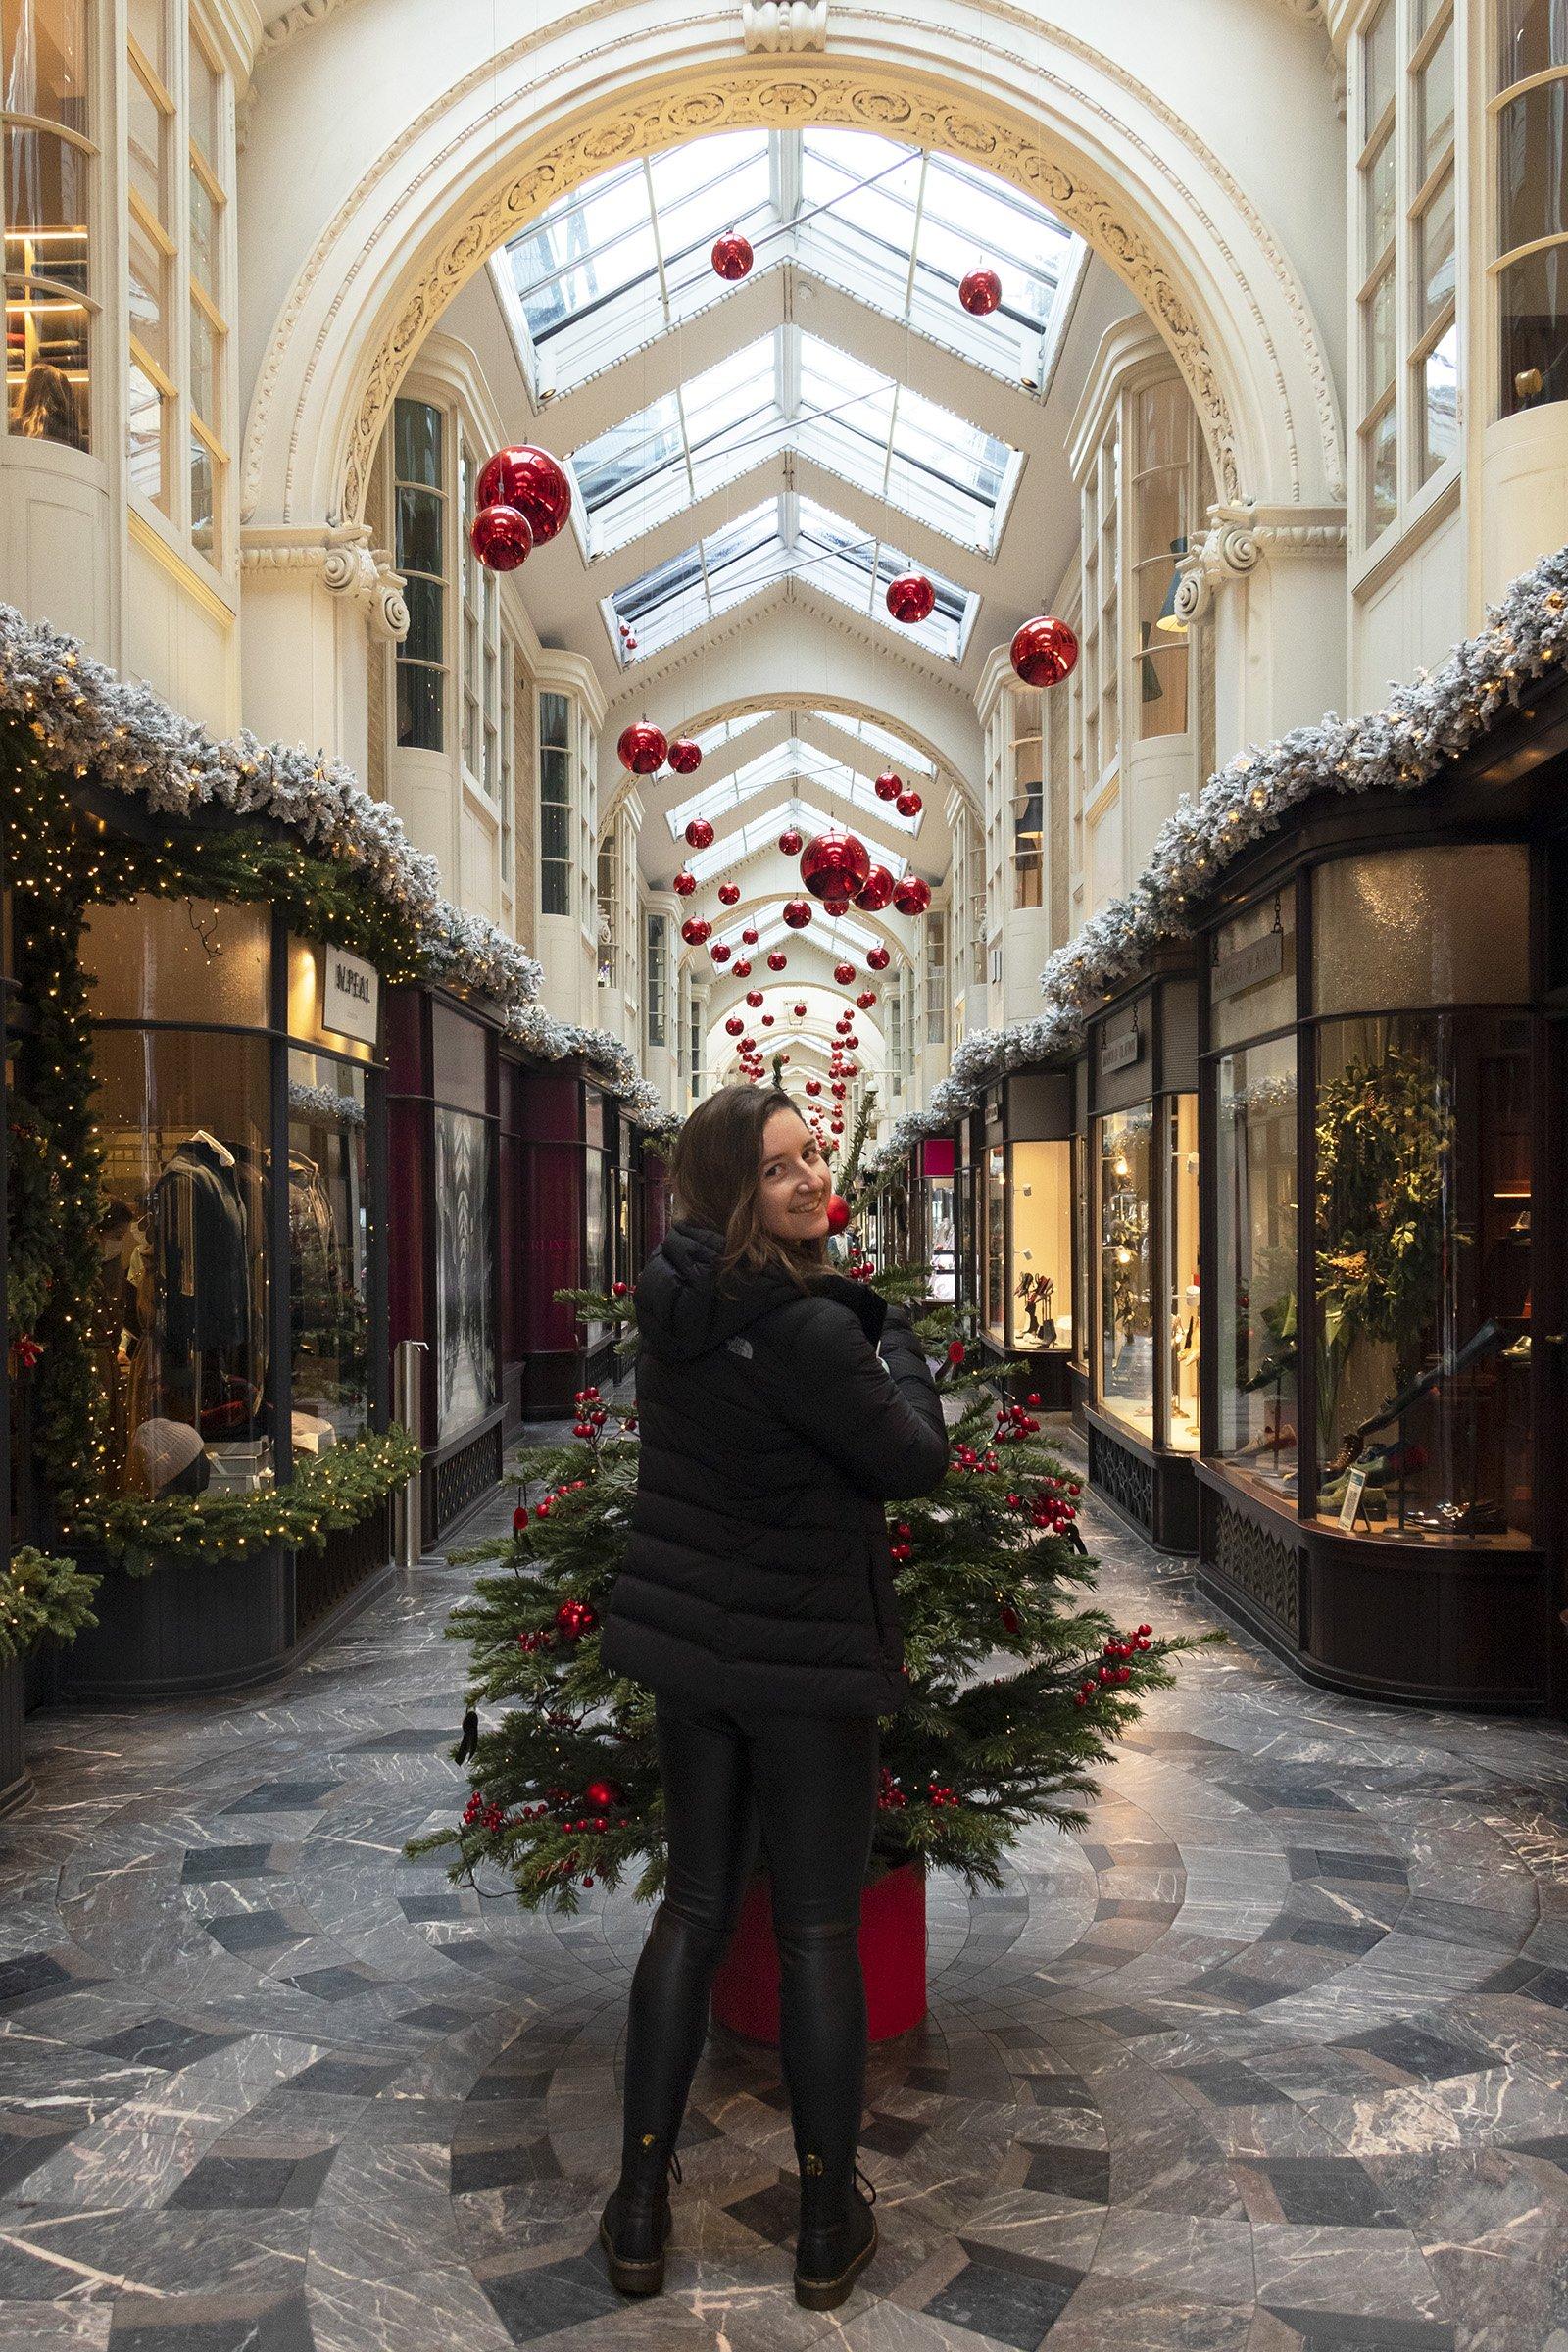 Burlington Arcade at Christmas